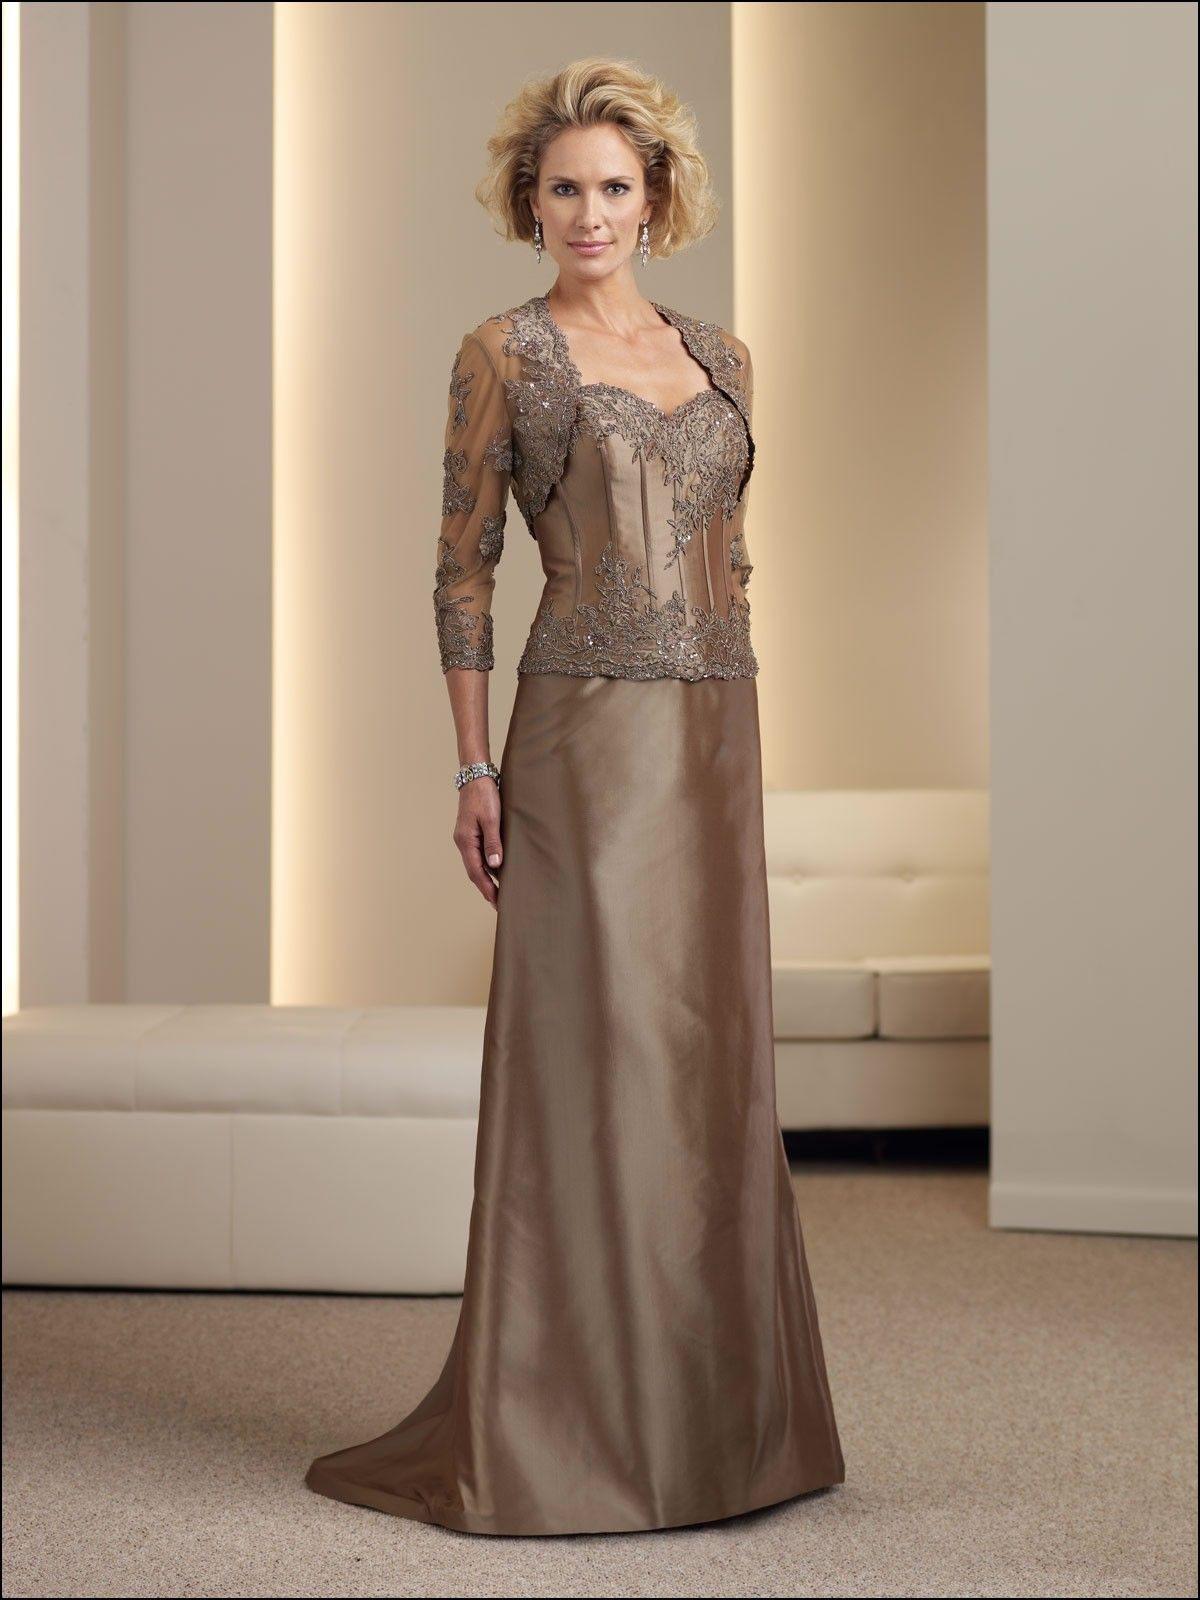 Wedding dresses for brides mom wedding ideas pinterest wedding